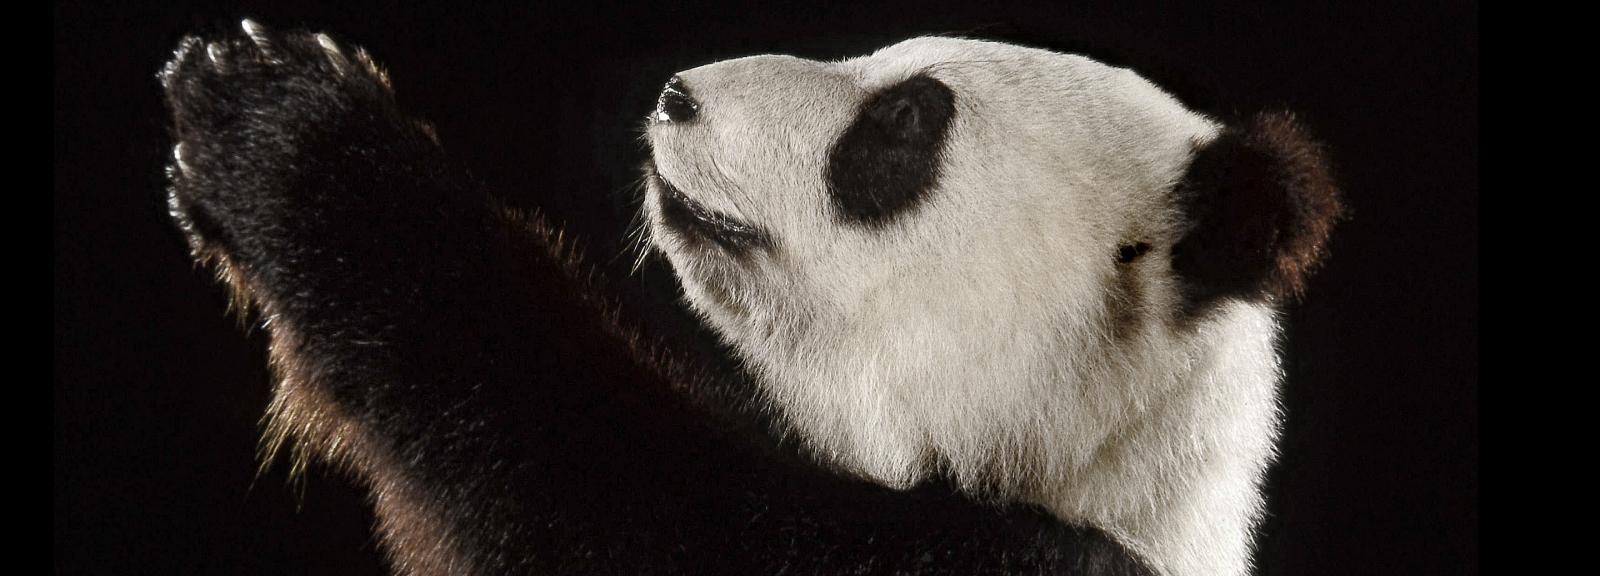 Li li, le grand panda du Président Pompidou © MNHN - L. Bessol